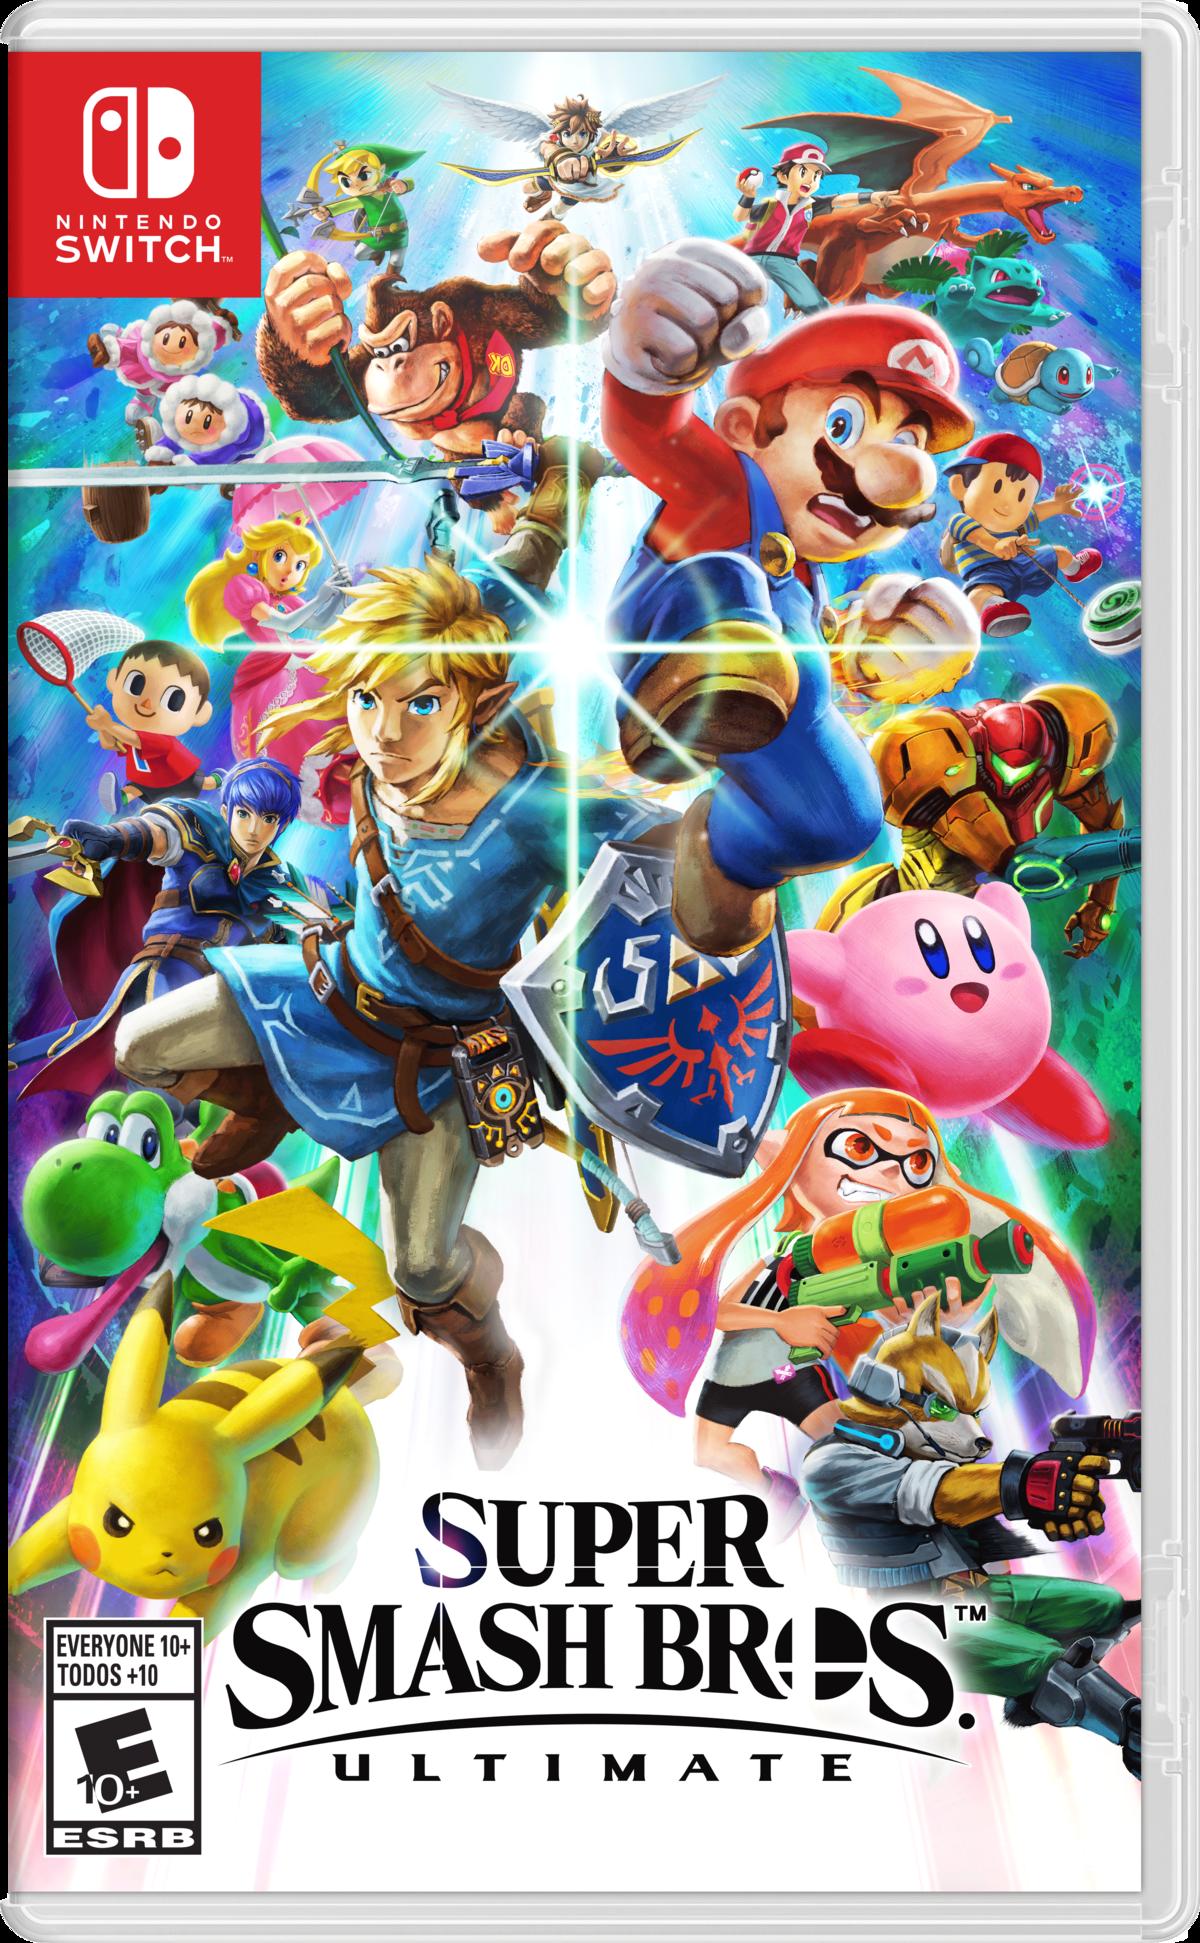 Super Smash Bros. Ultimate.